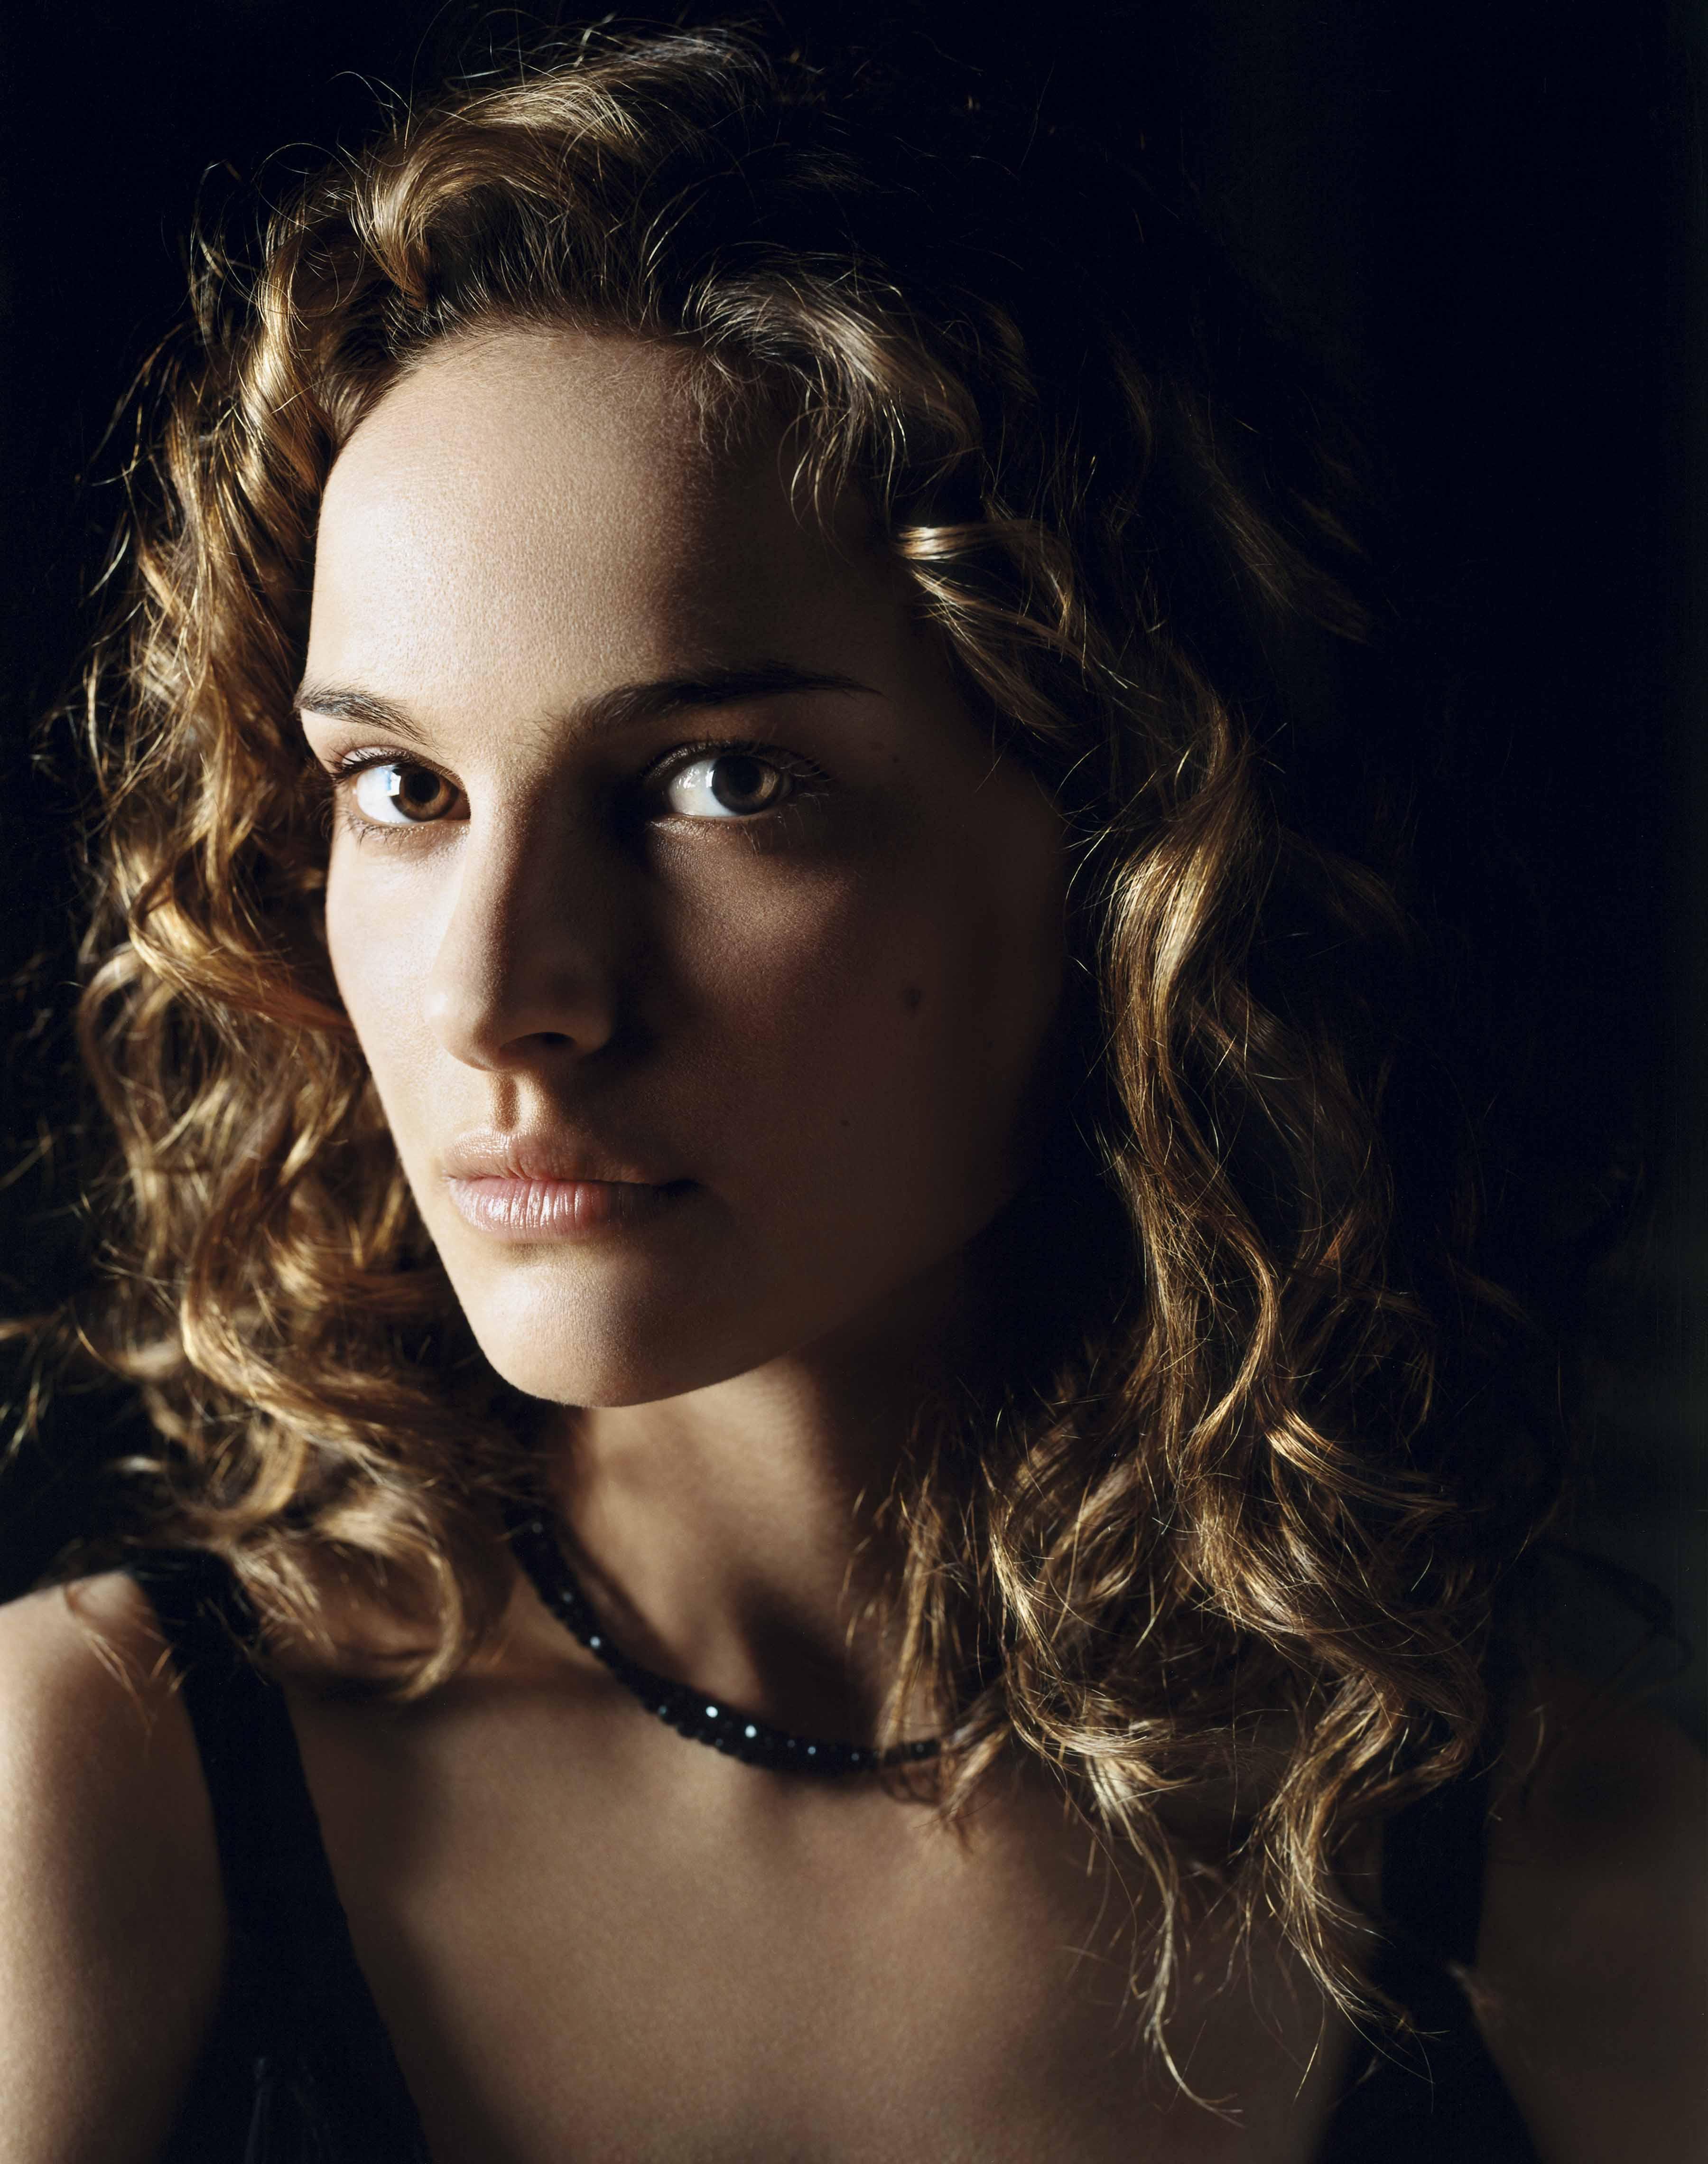 Natalie Portman V For Vendetta